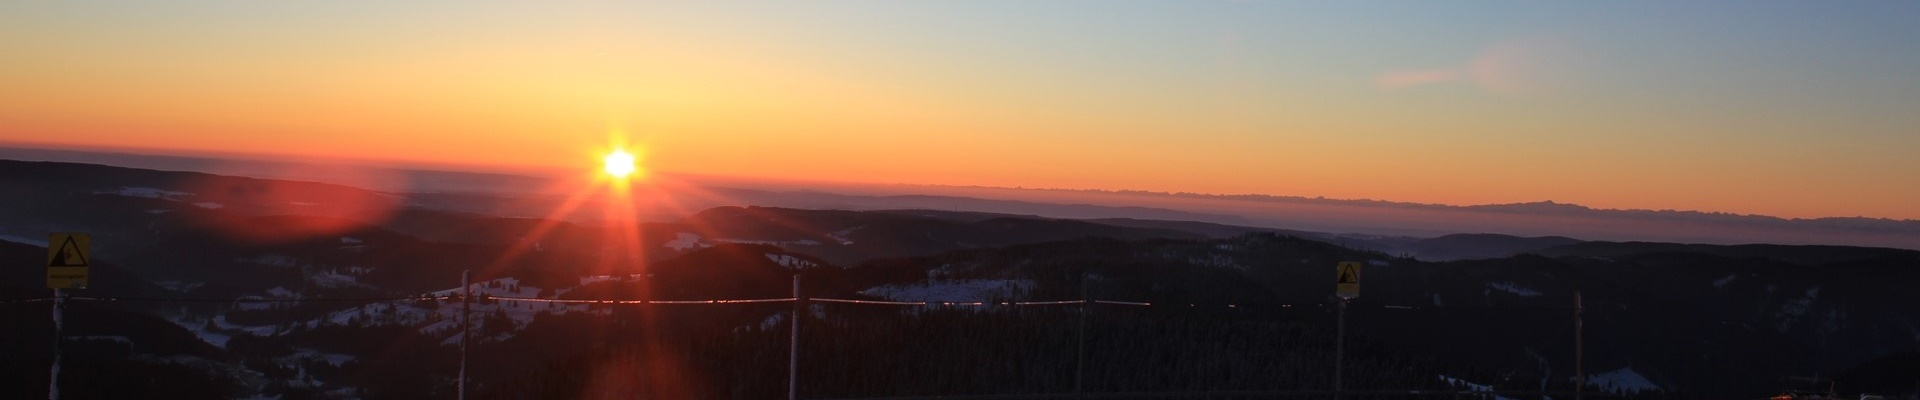 Sonnenuntergang am verschneiten Feldberg / Griesbachhof-Schwarzwald